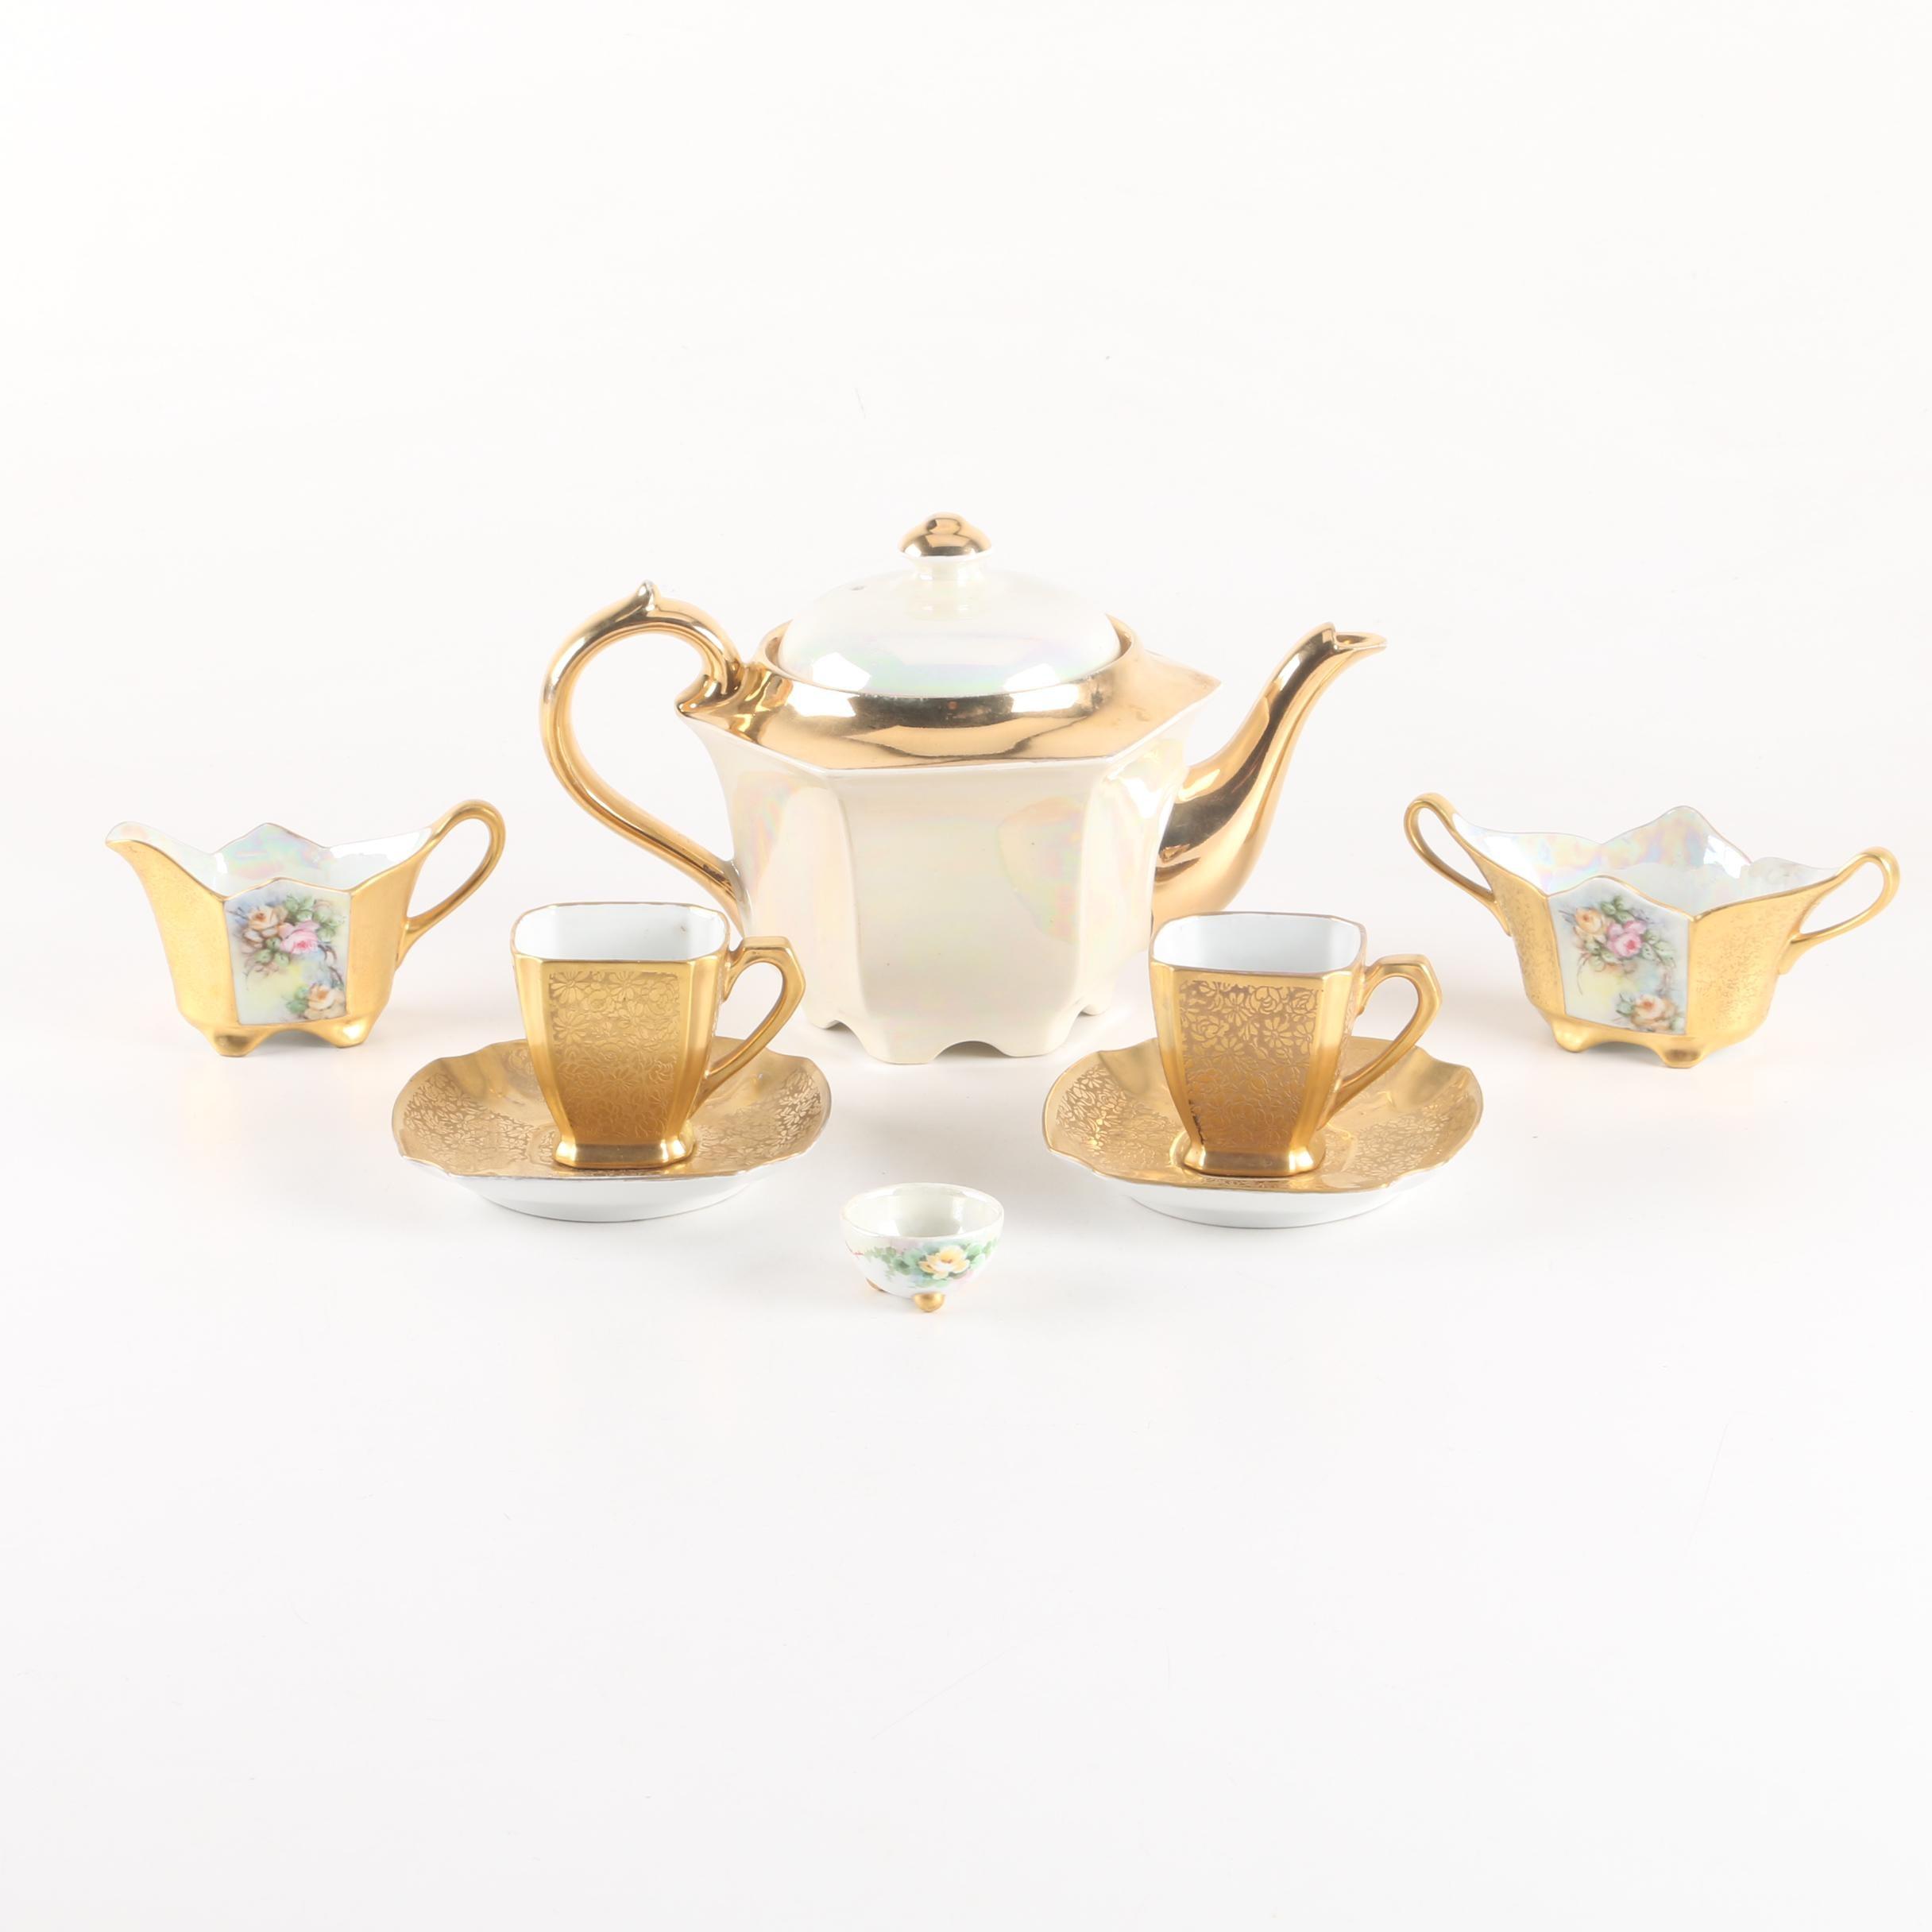 Sadler Earthenware Teapot and Gilt Porcelain Tableware